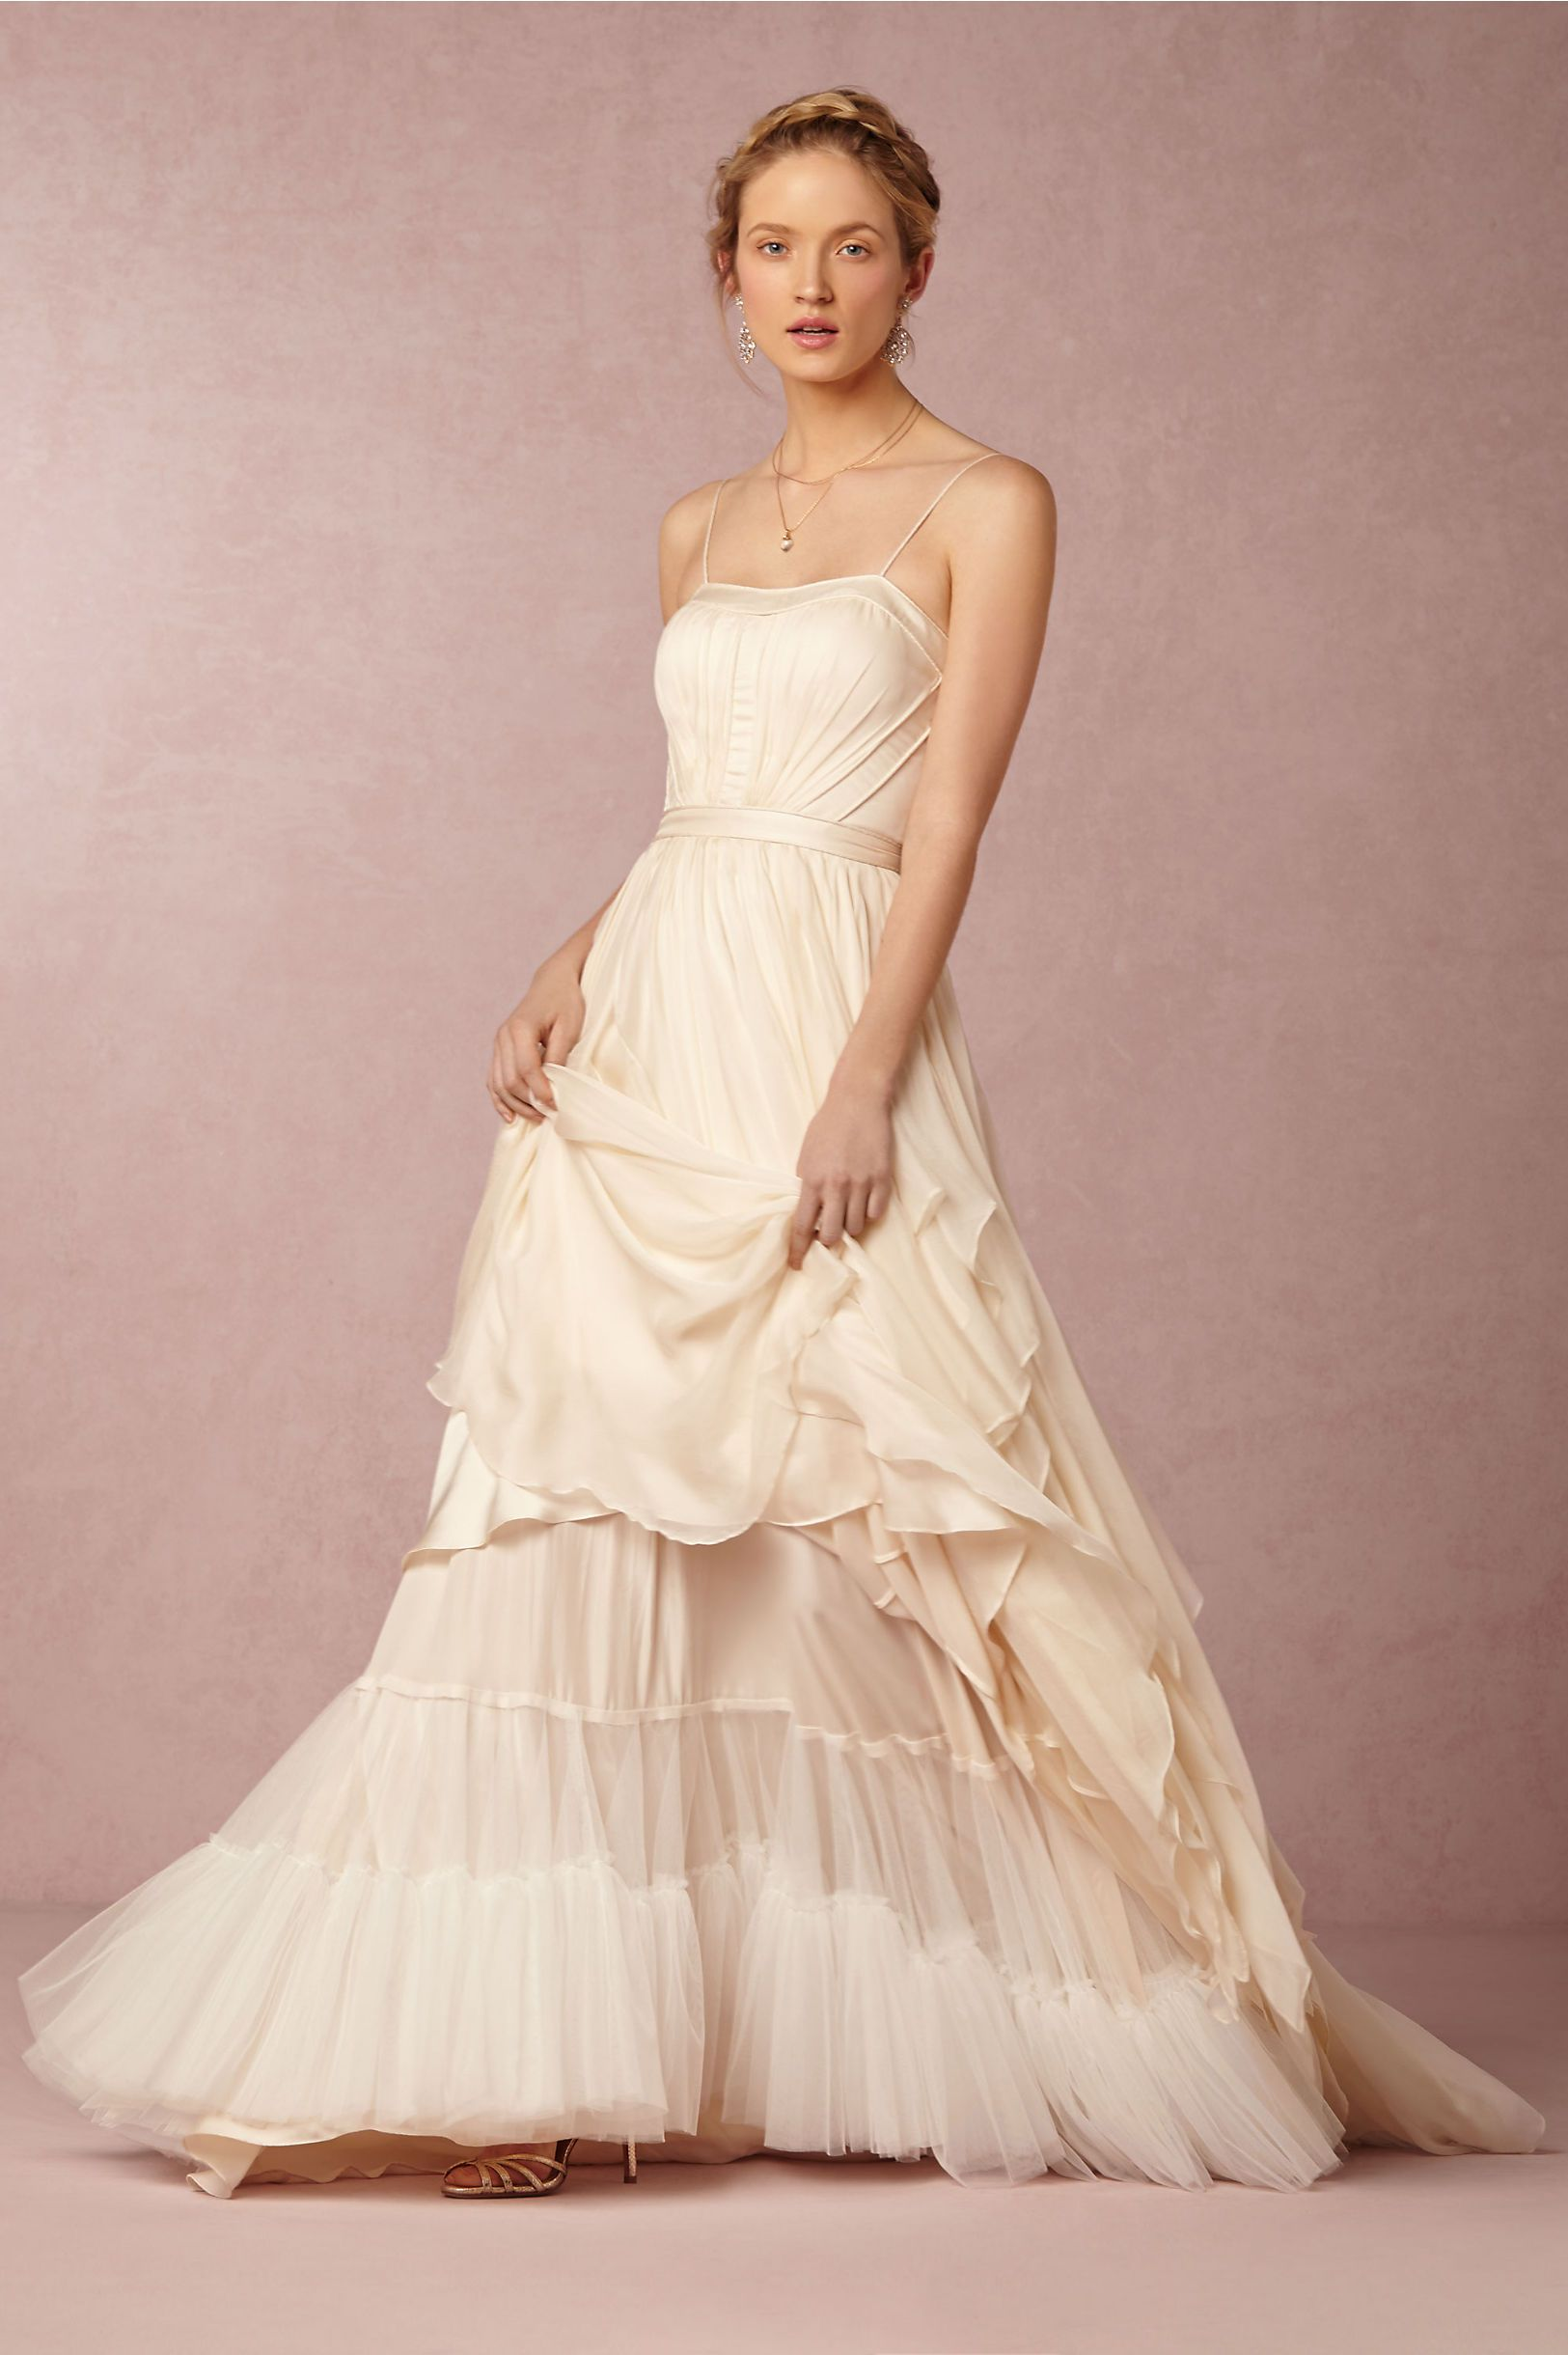 Cascada Gown and Cascada Petticoat in Bride Wedding Dresses at BHLDN ...